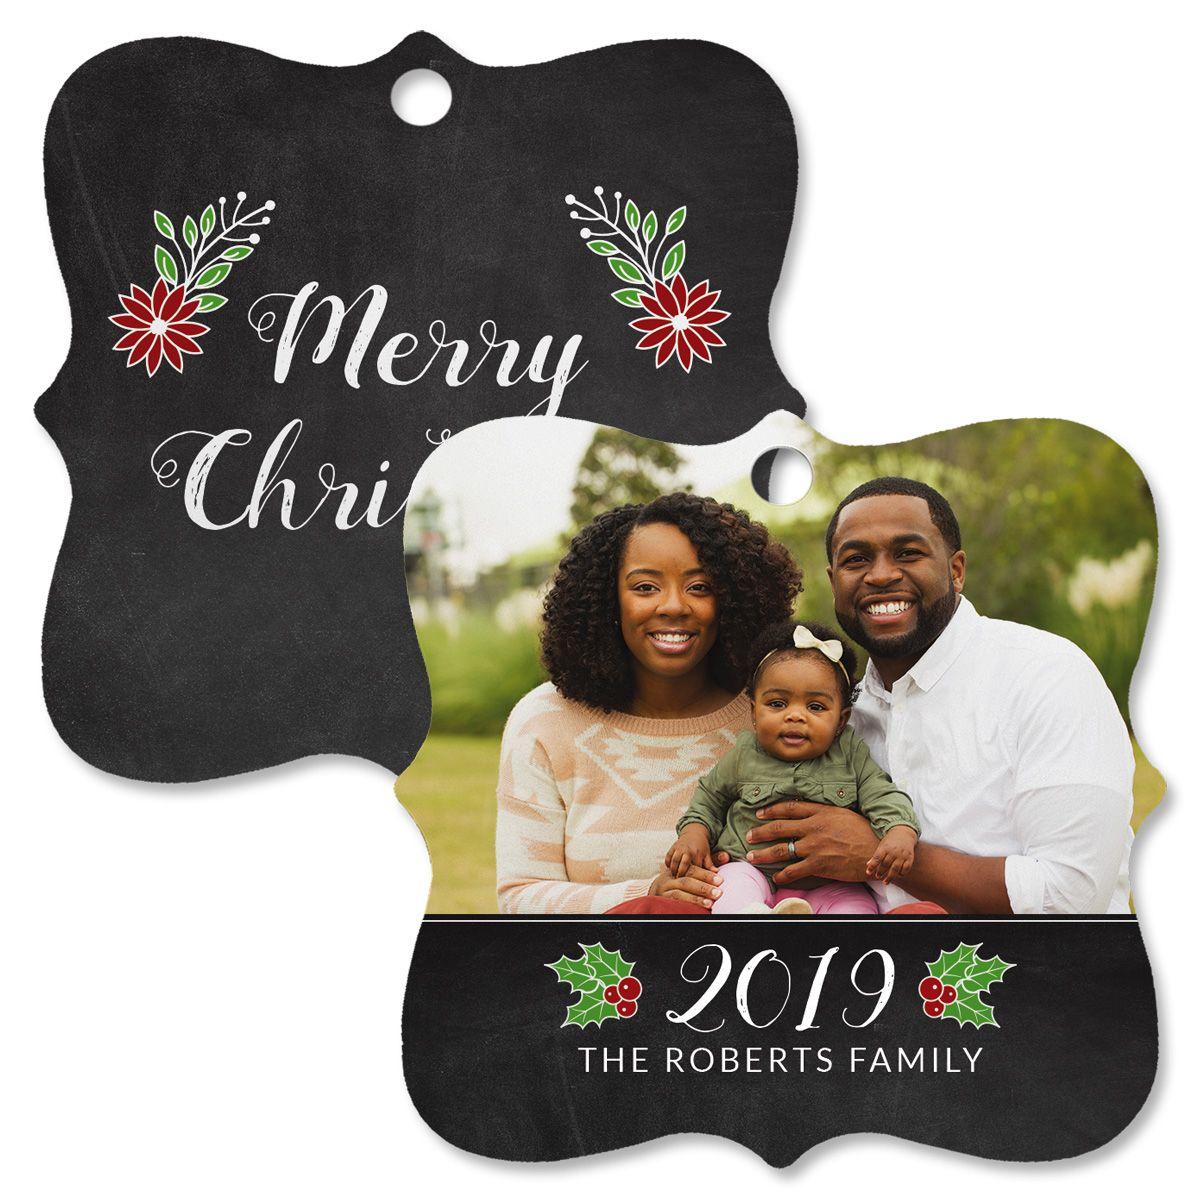 Merry Chalkboard Photo Ornament – Square Bracket